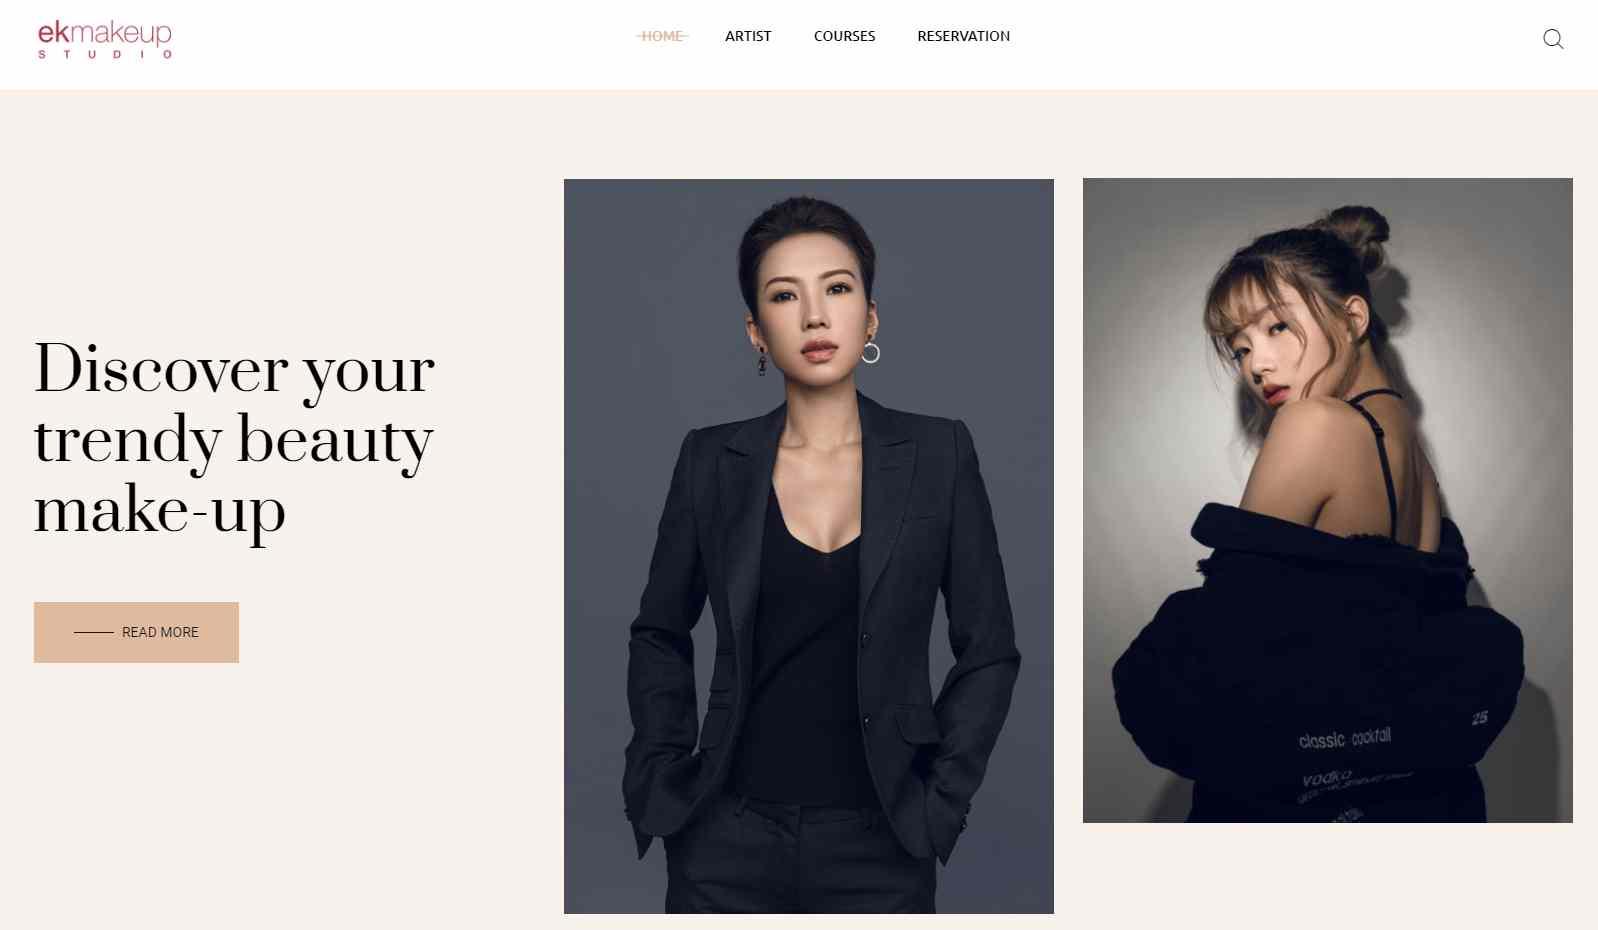 ek makeup studio Top Makeup Artists in Singapore